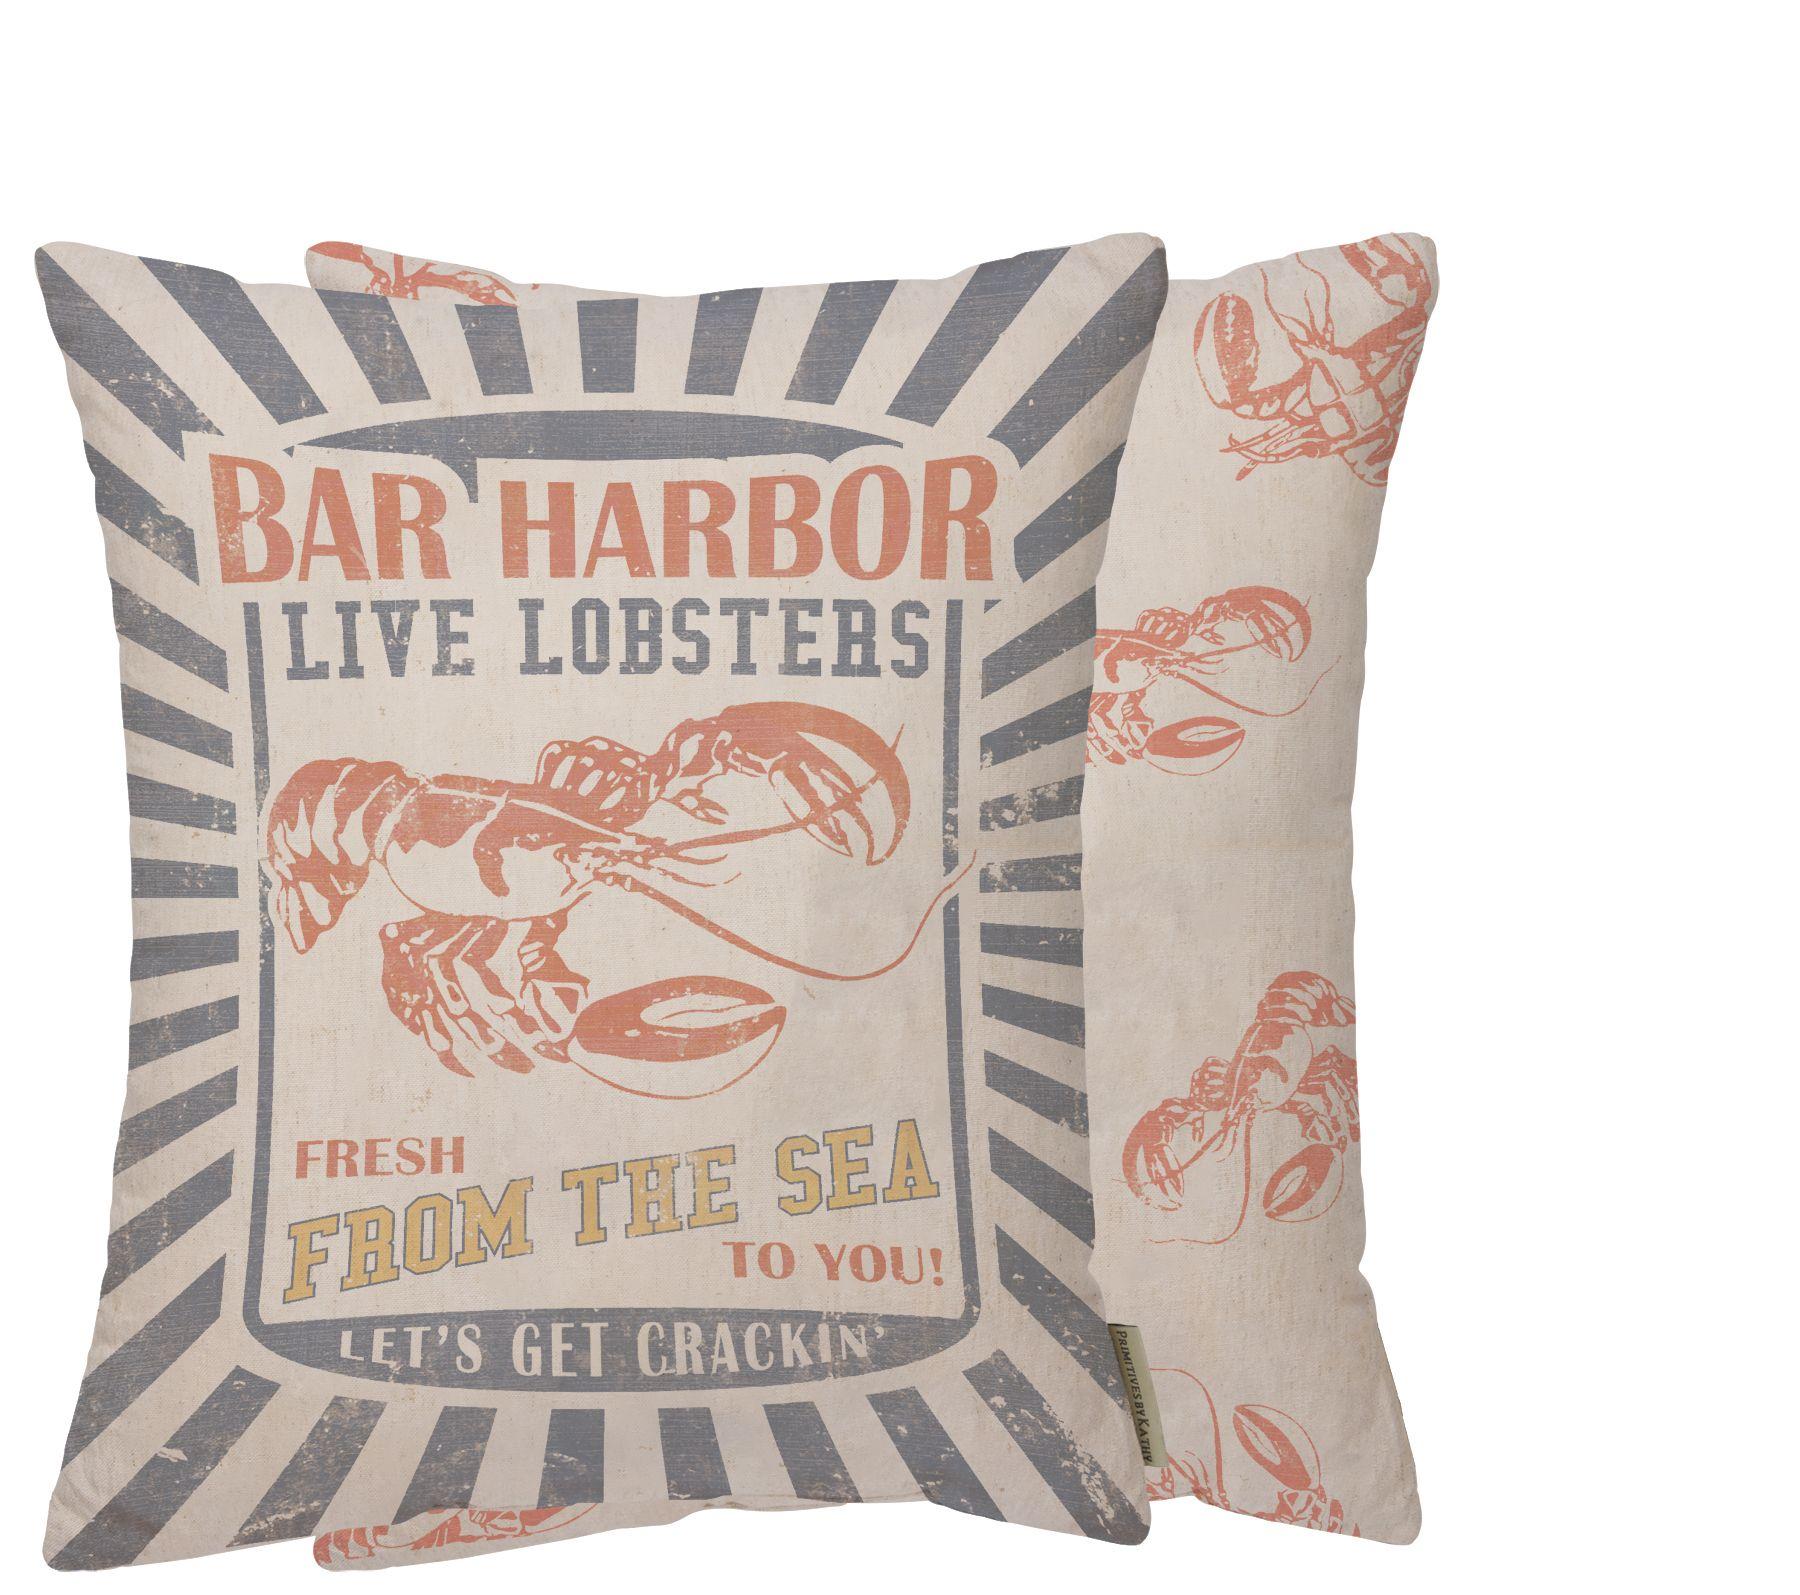 Bar harbor lobster feed sack pillow